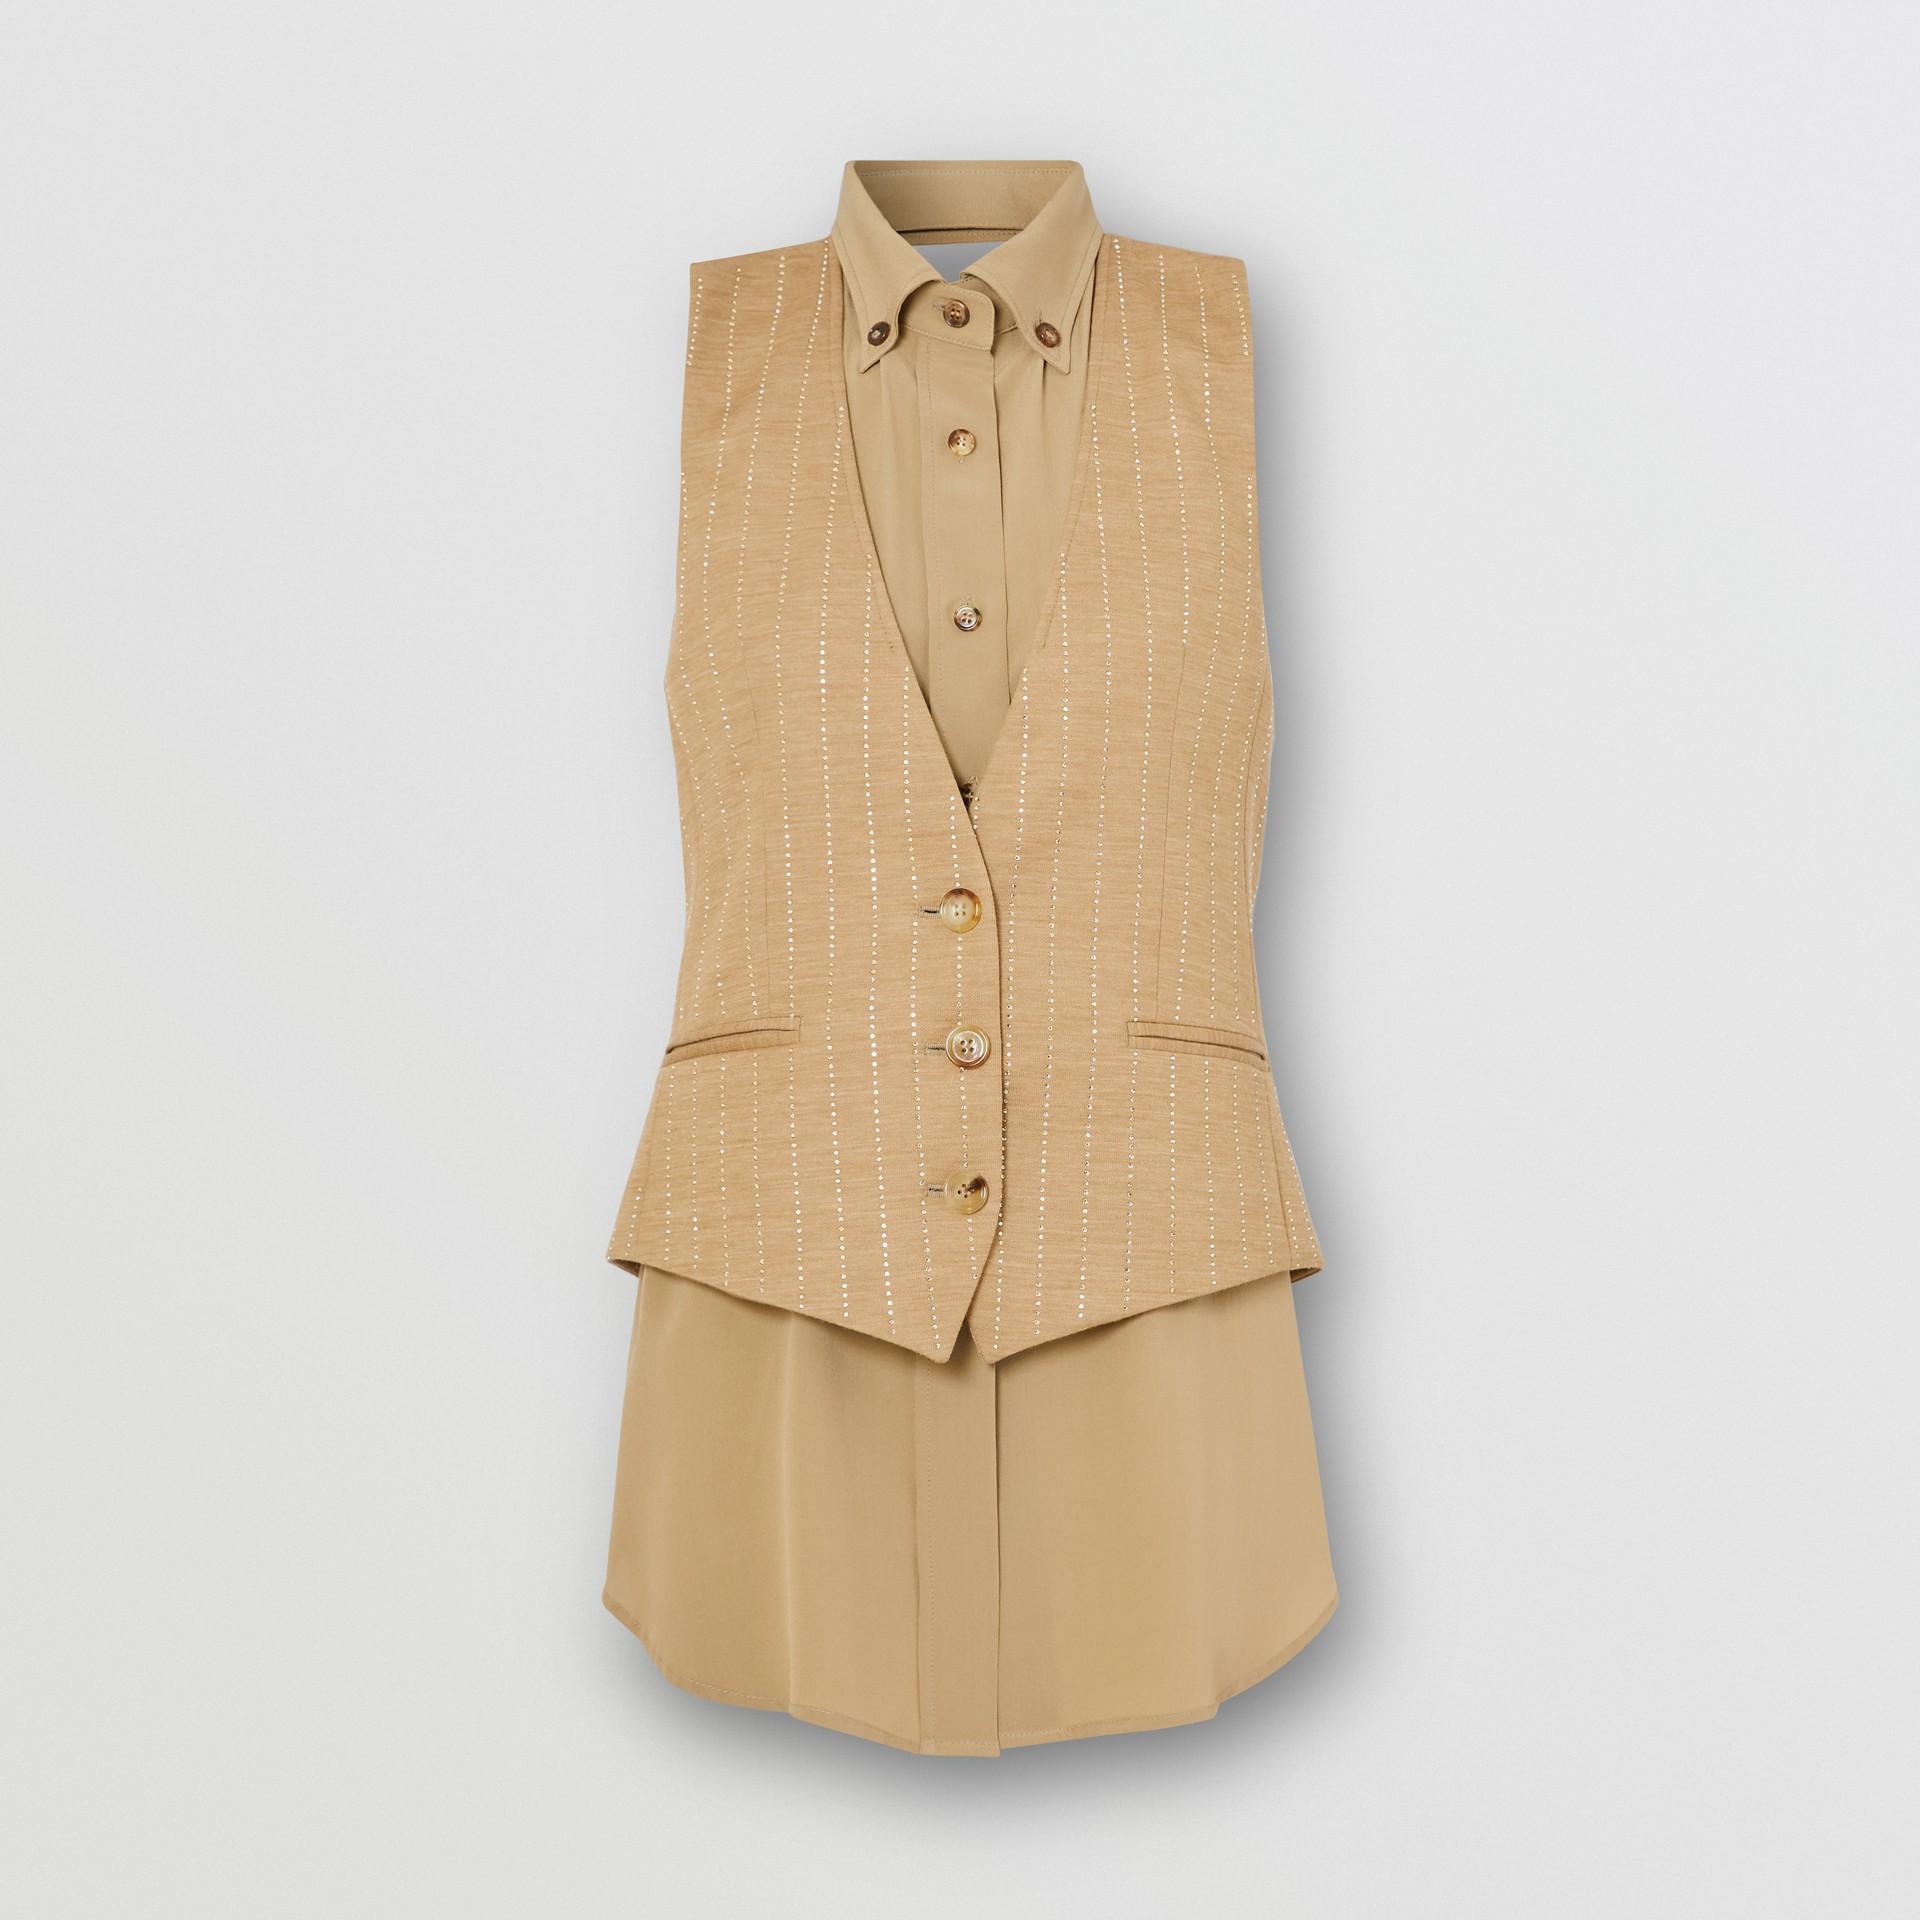 Shirt Detail Crystal Pinstriped Wool Blend Waistcoat in Pecan Melange - Women | Burberry Australia - gallery image 3